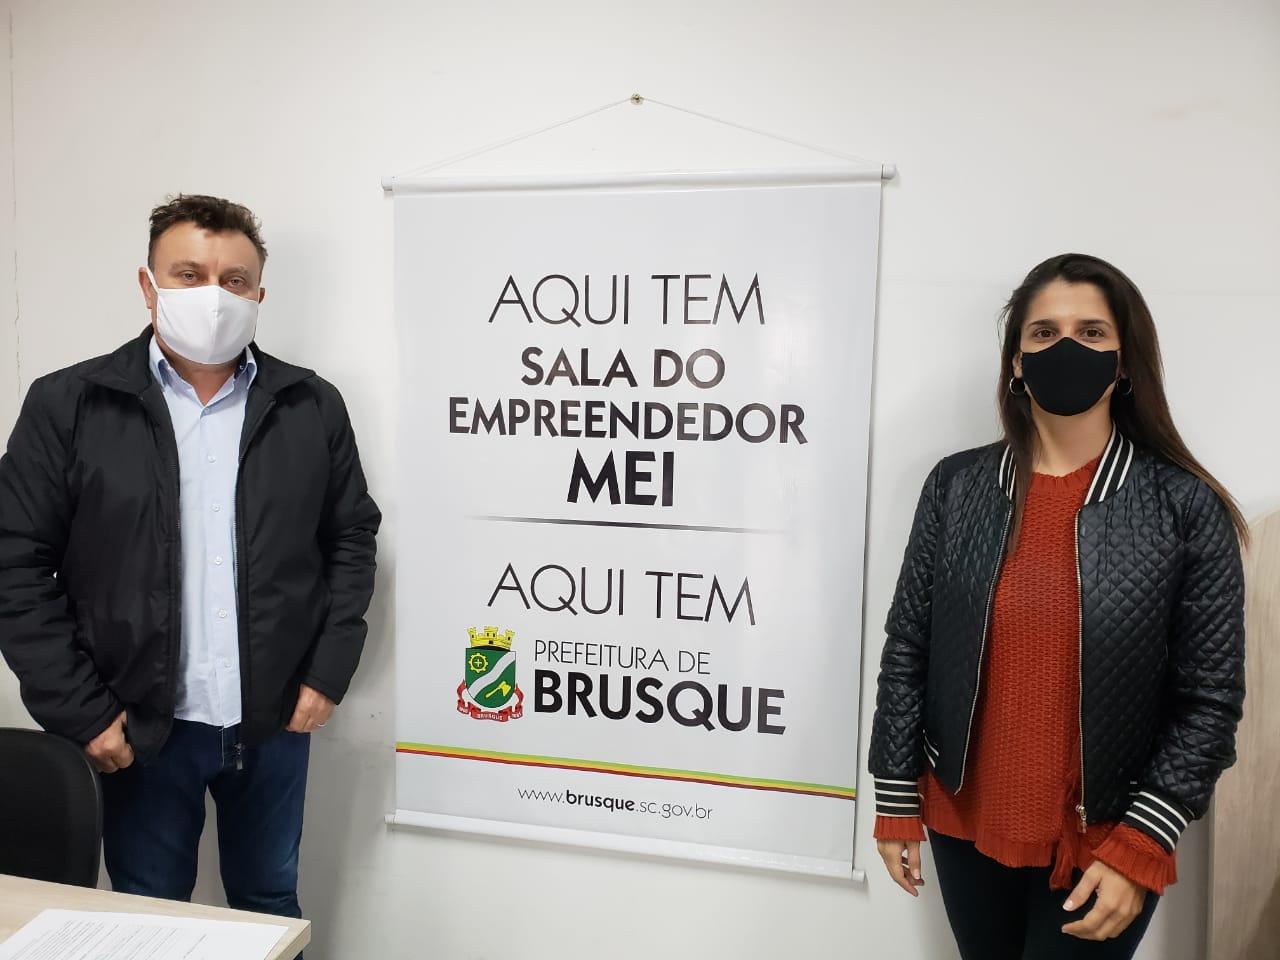 Prefeitura de Brusque e Sebrae promovem consultoria gratuita a partir de segunda-feira (10)